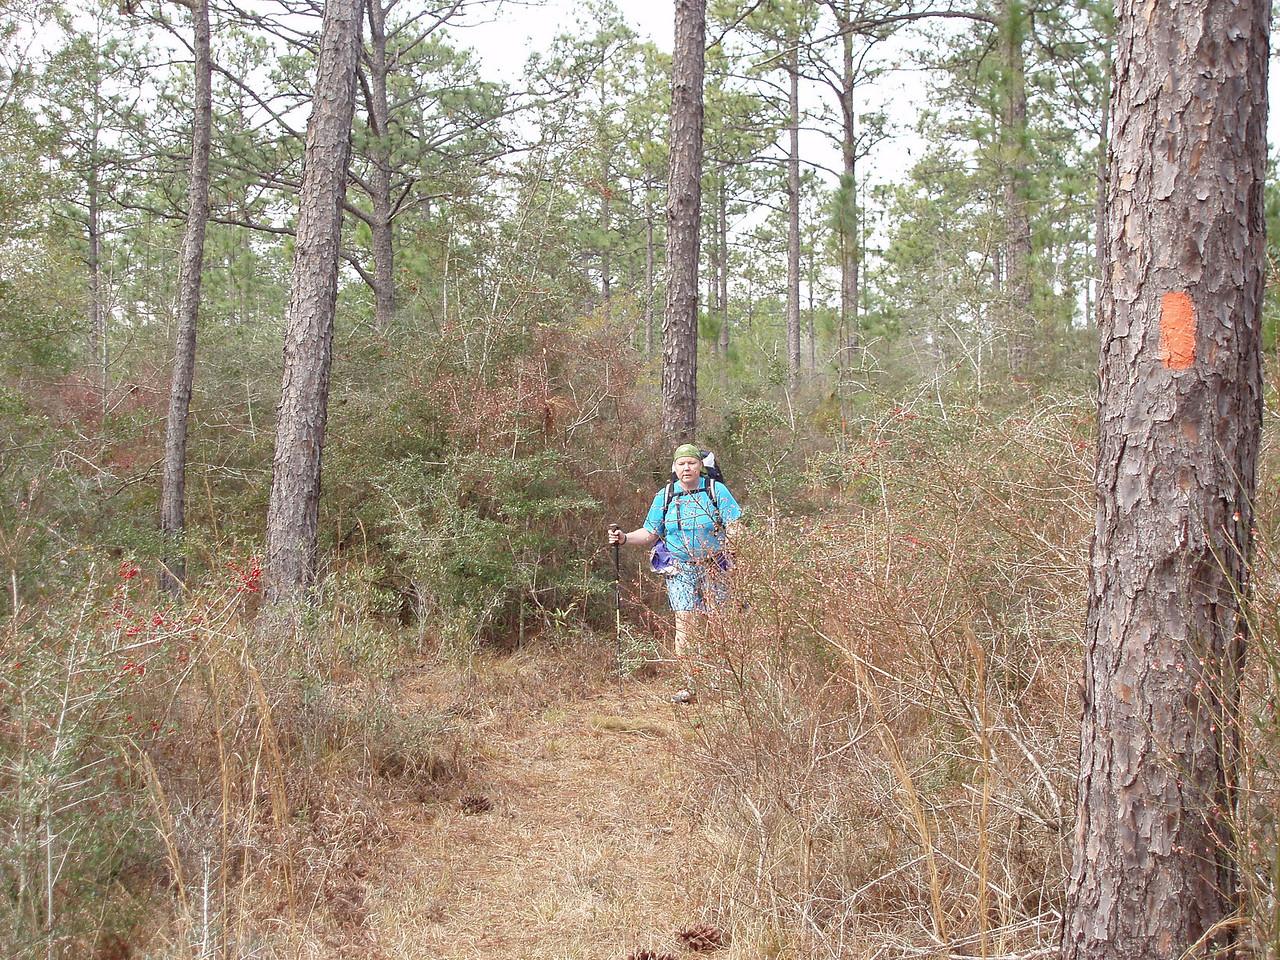 Sue Turner backpacking through Eglin<br /> PHOTO CREDIT: Robert Coveney / Florida Trail Association